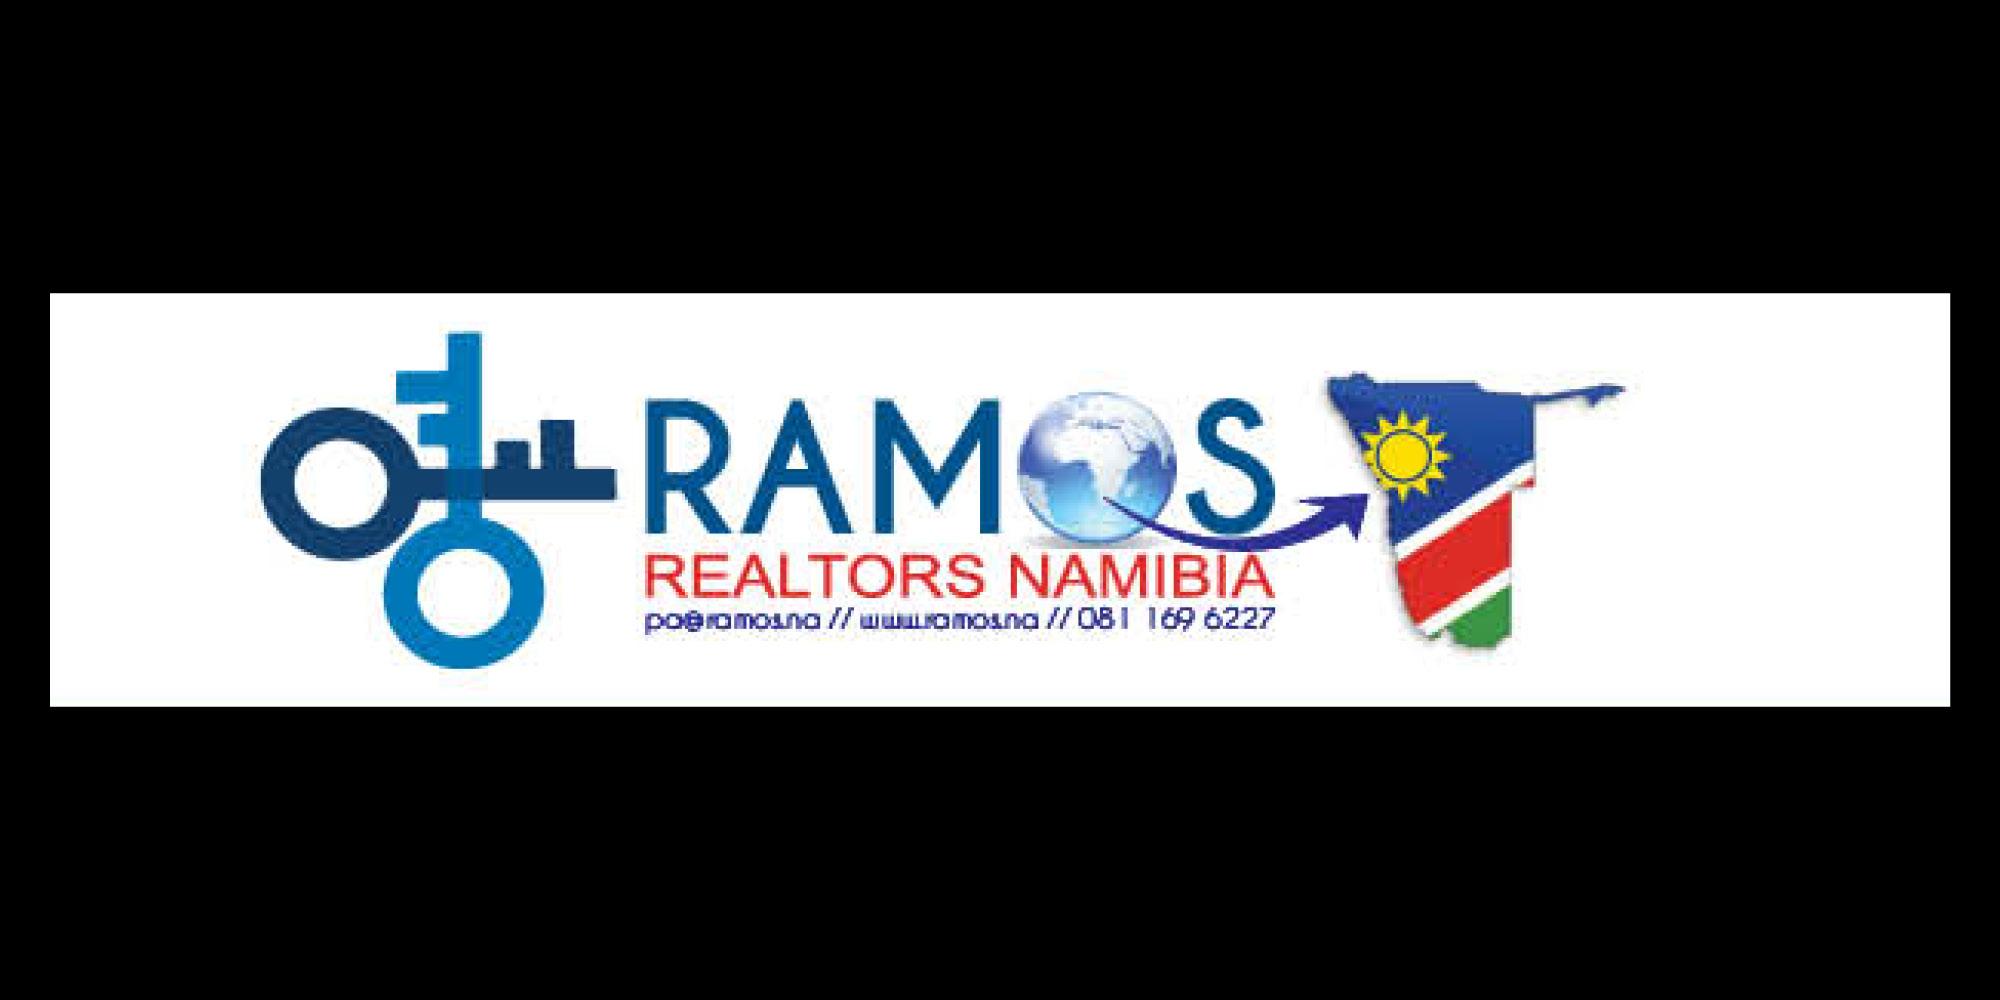 Ramos Realtors Namibia - Kuisebmund near Beach